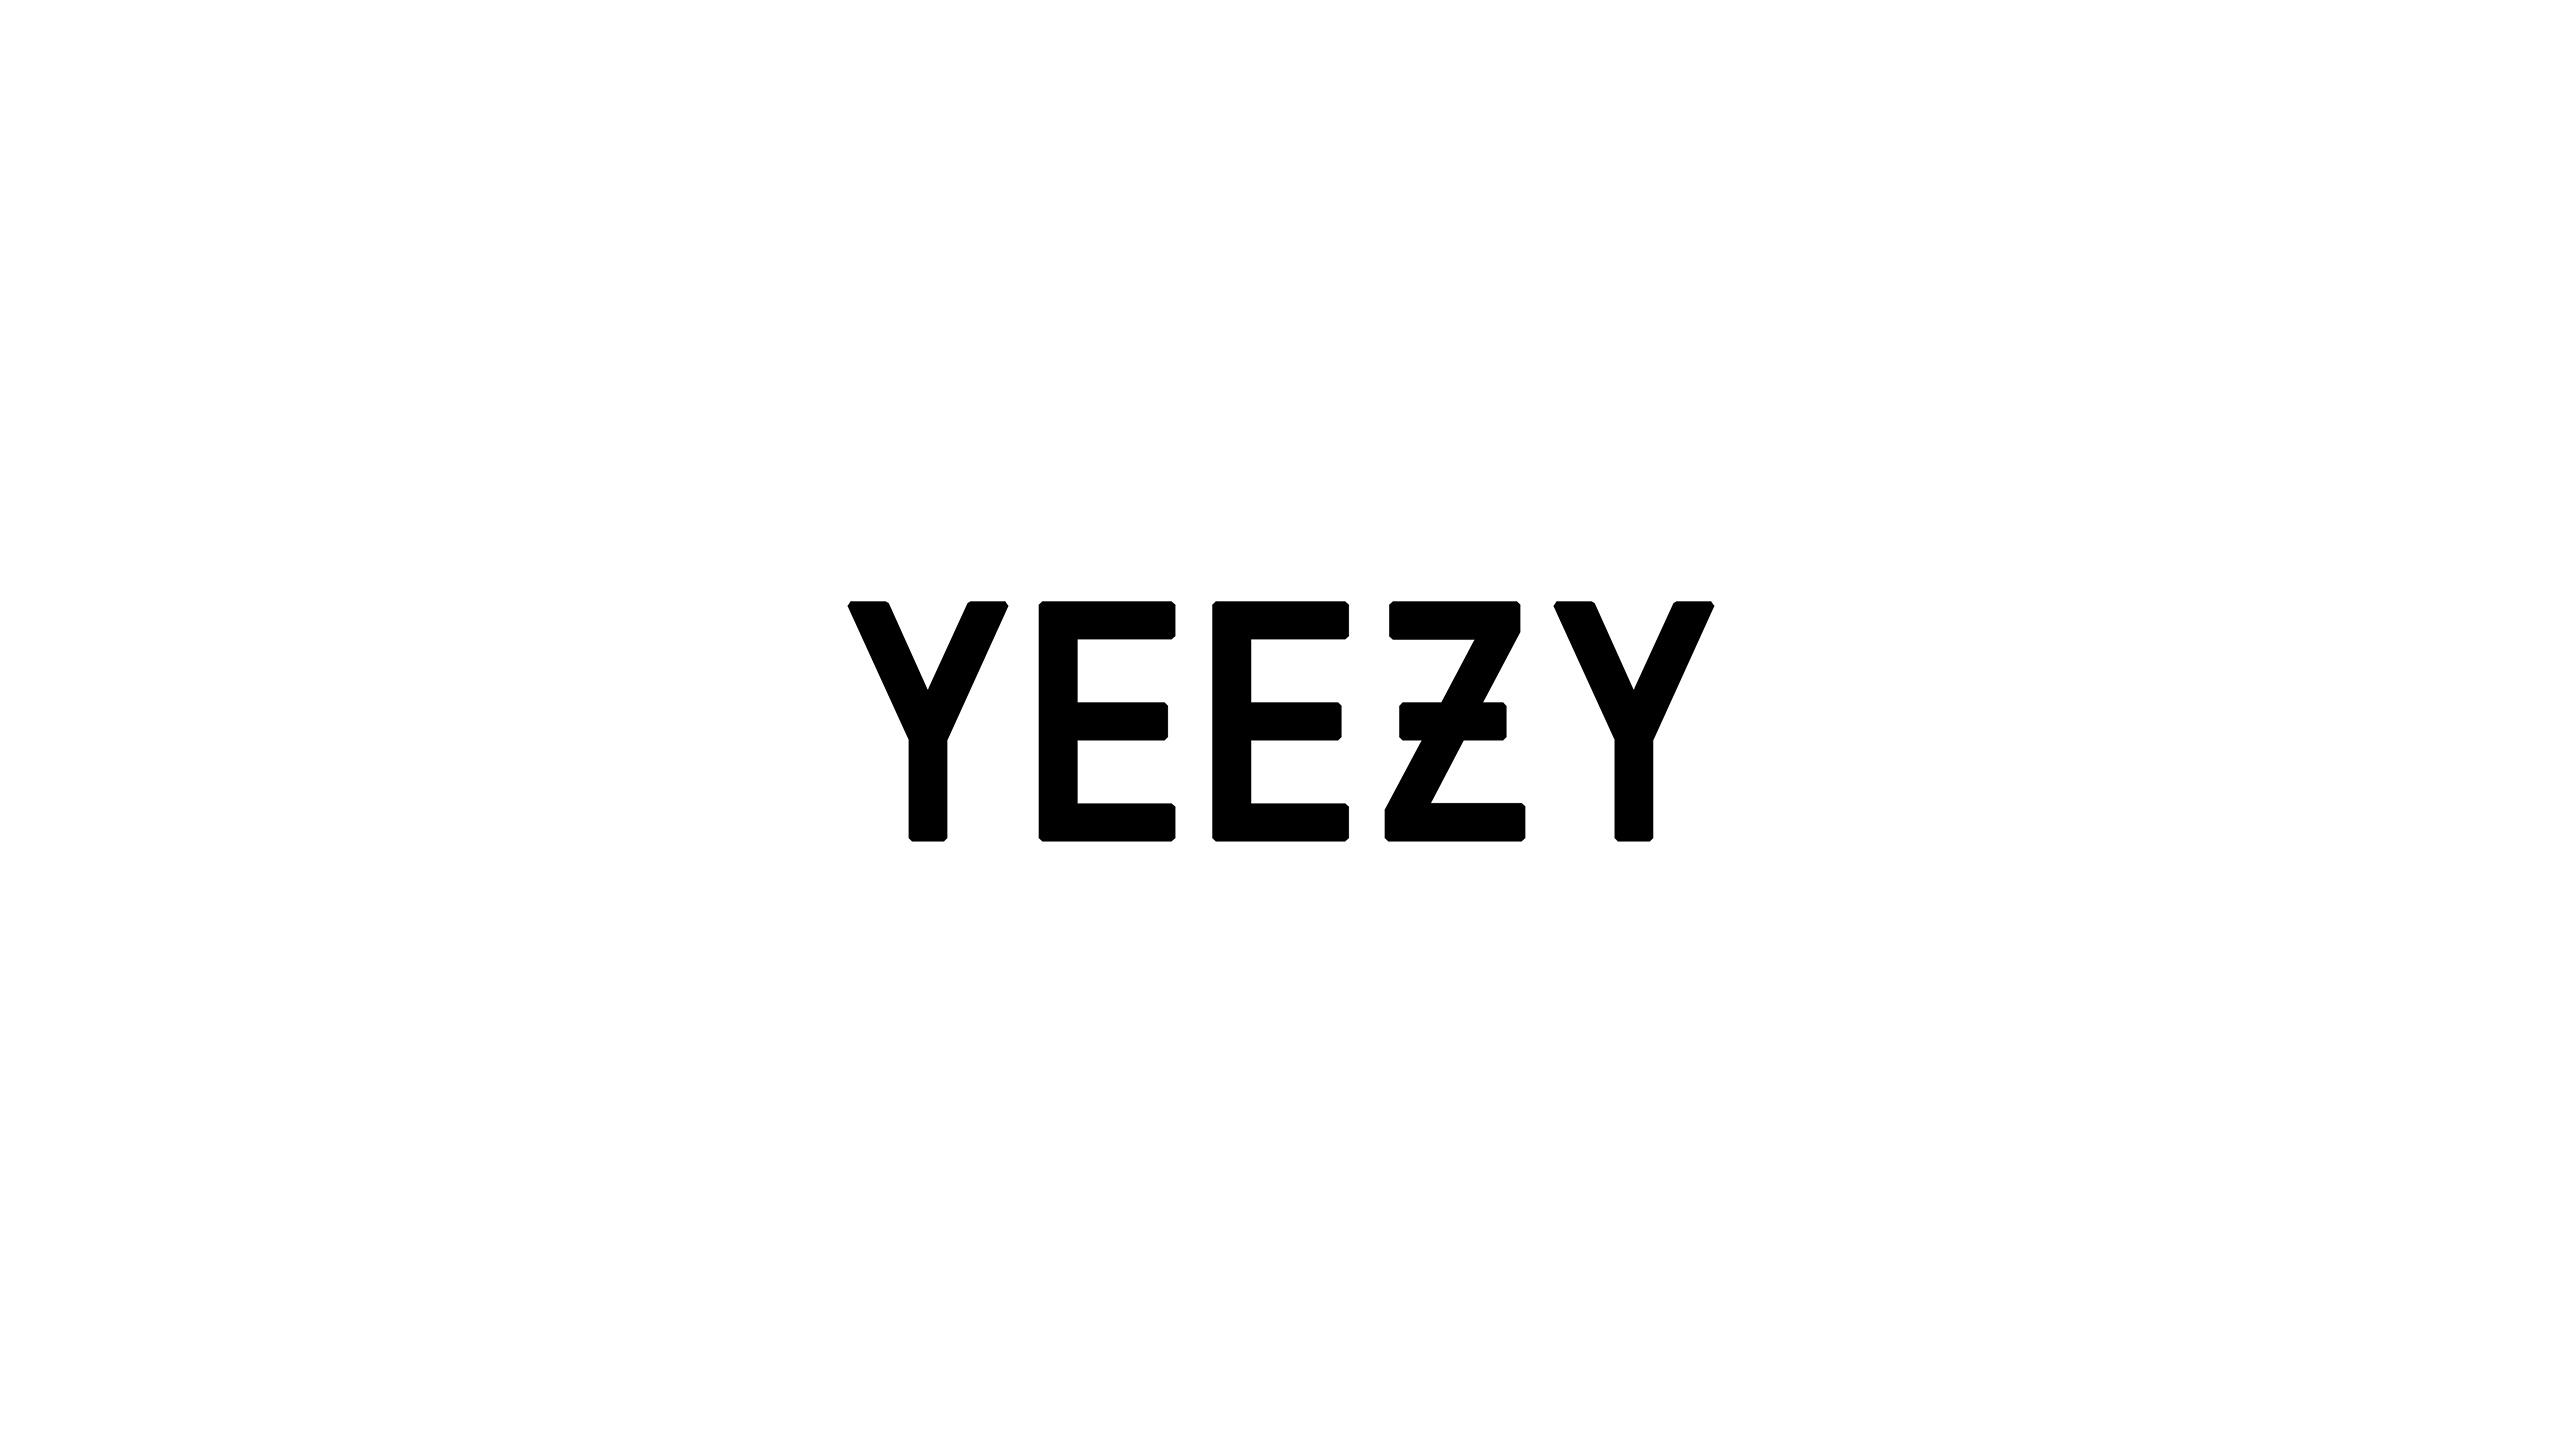 Yeezy White Wallpaper